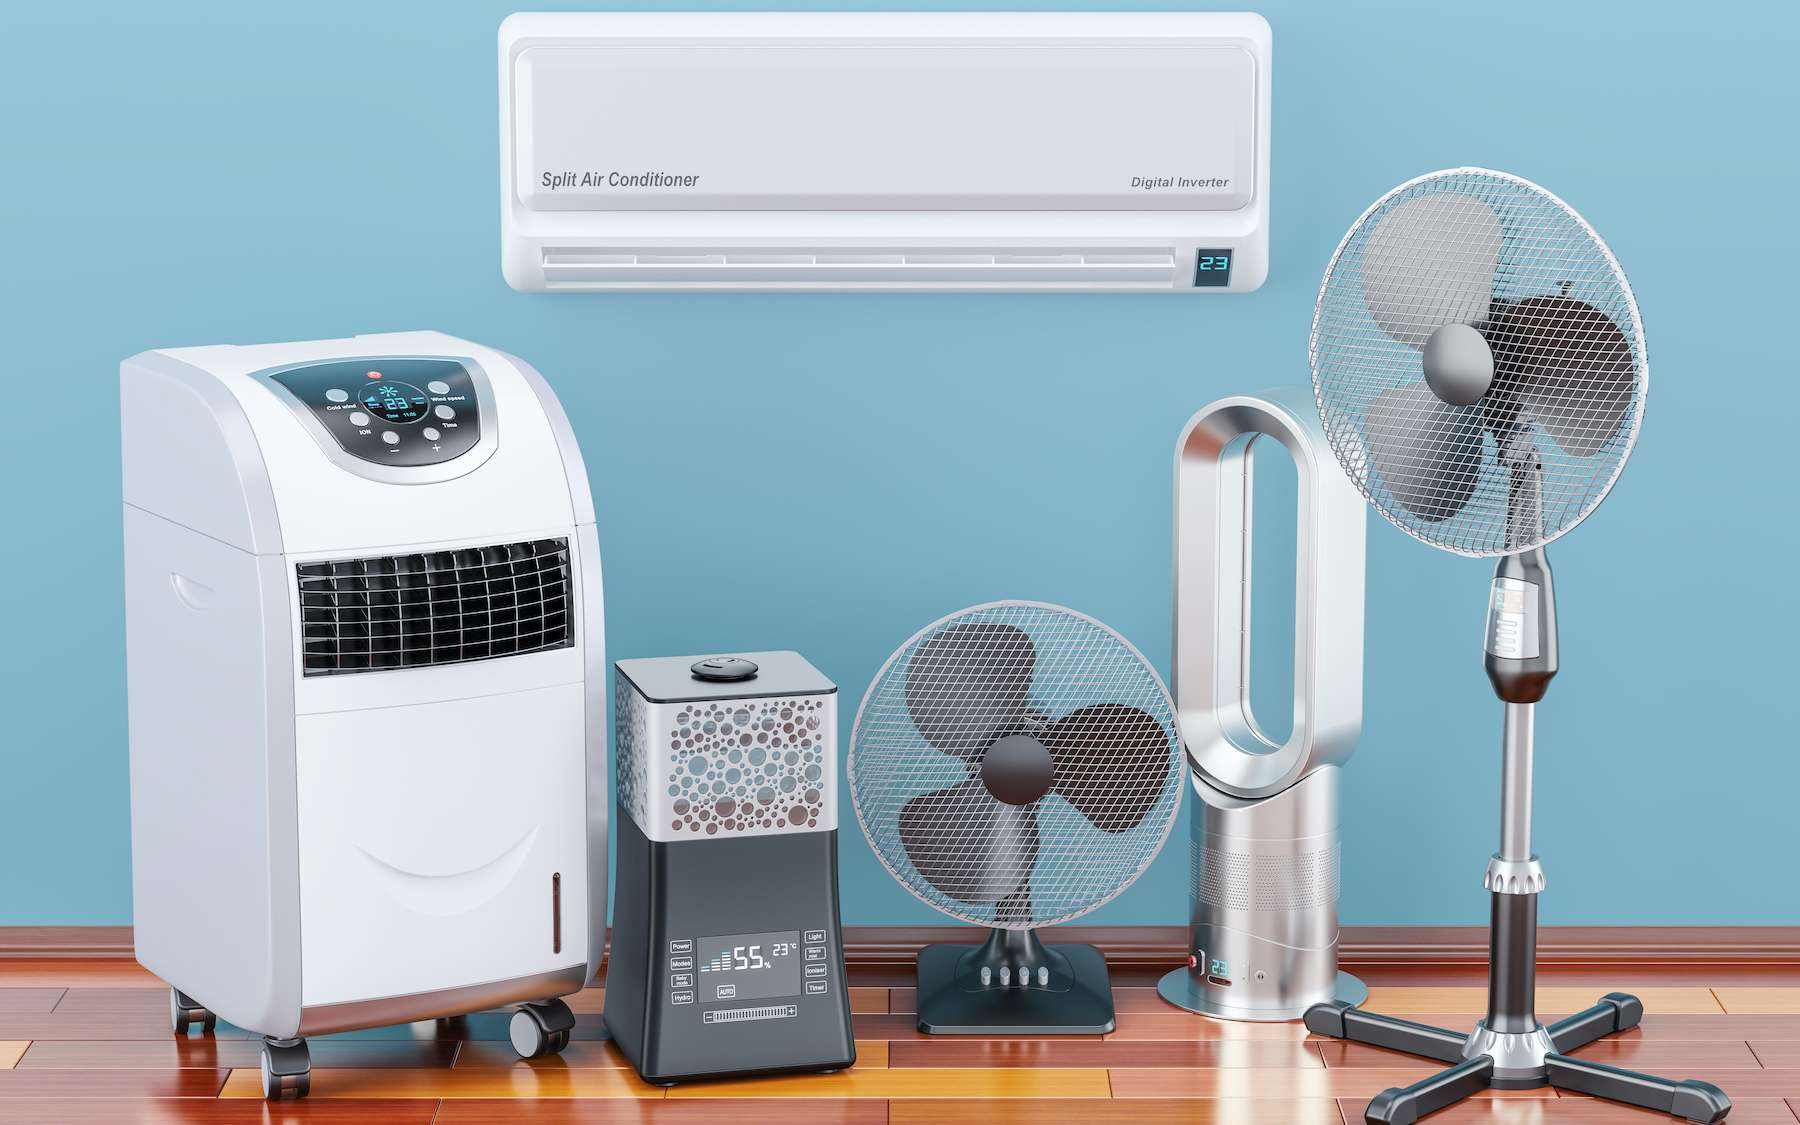 Ventilateur ou climatiseur : lequel choisir ? © alexlmx, Adobe Stock